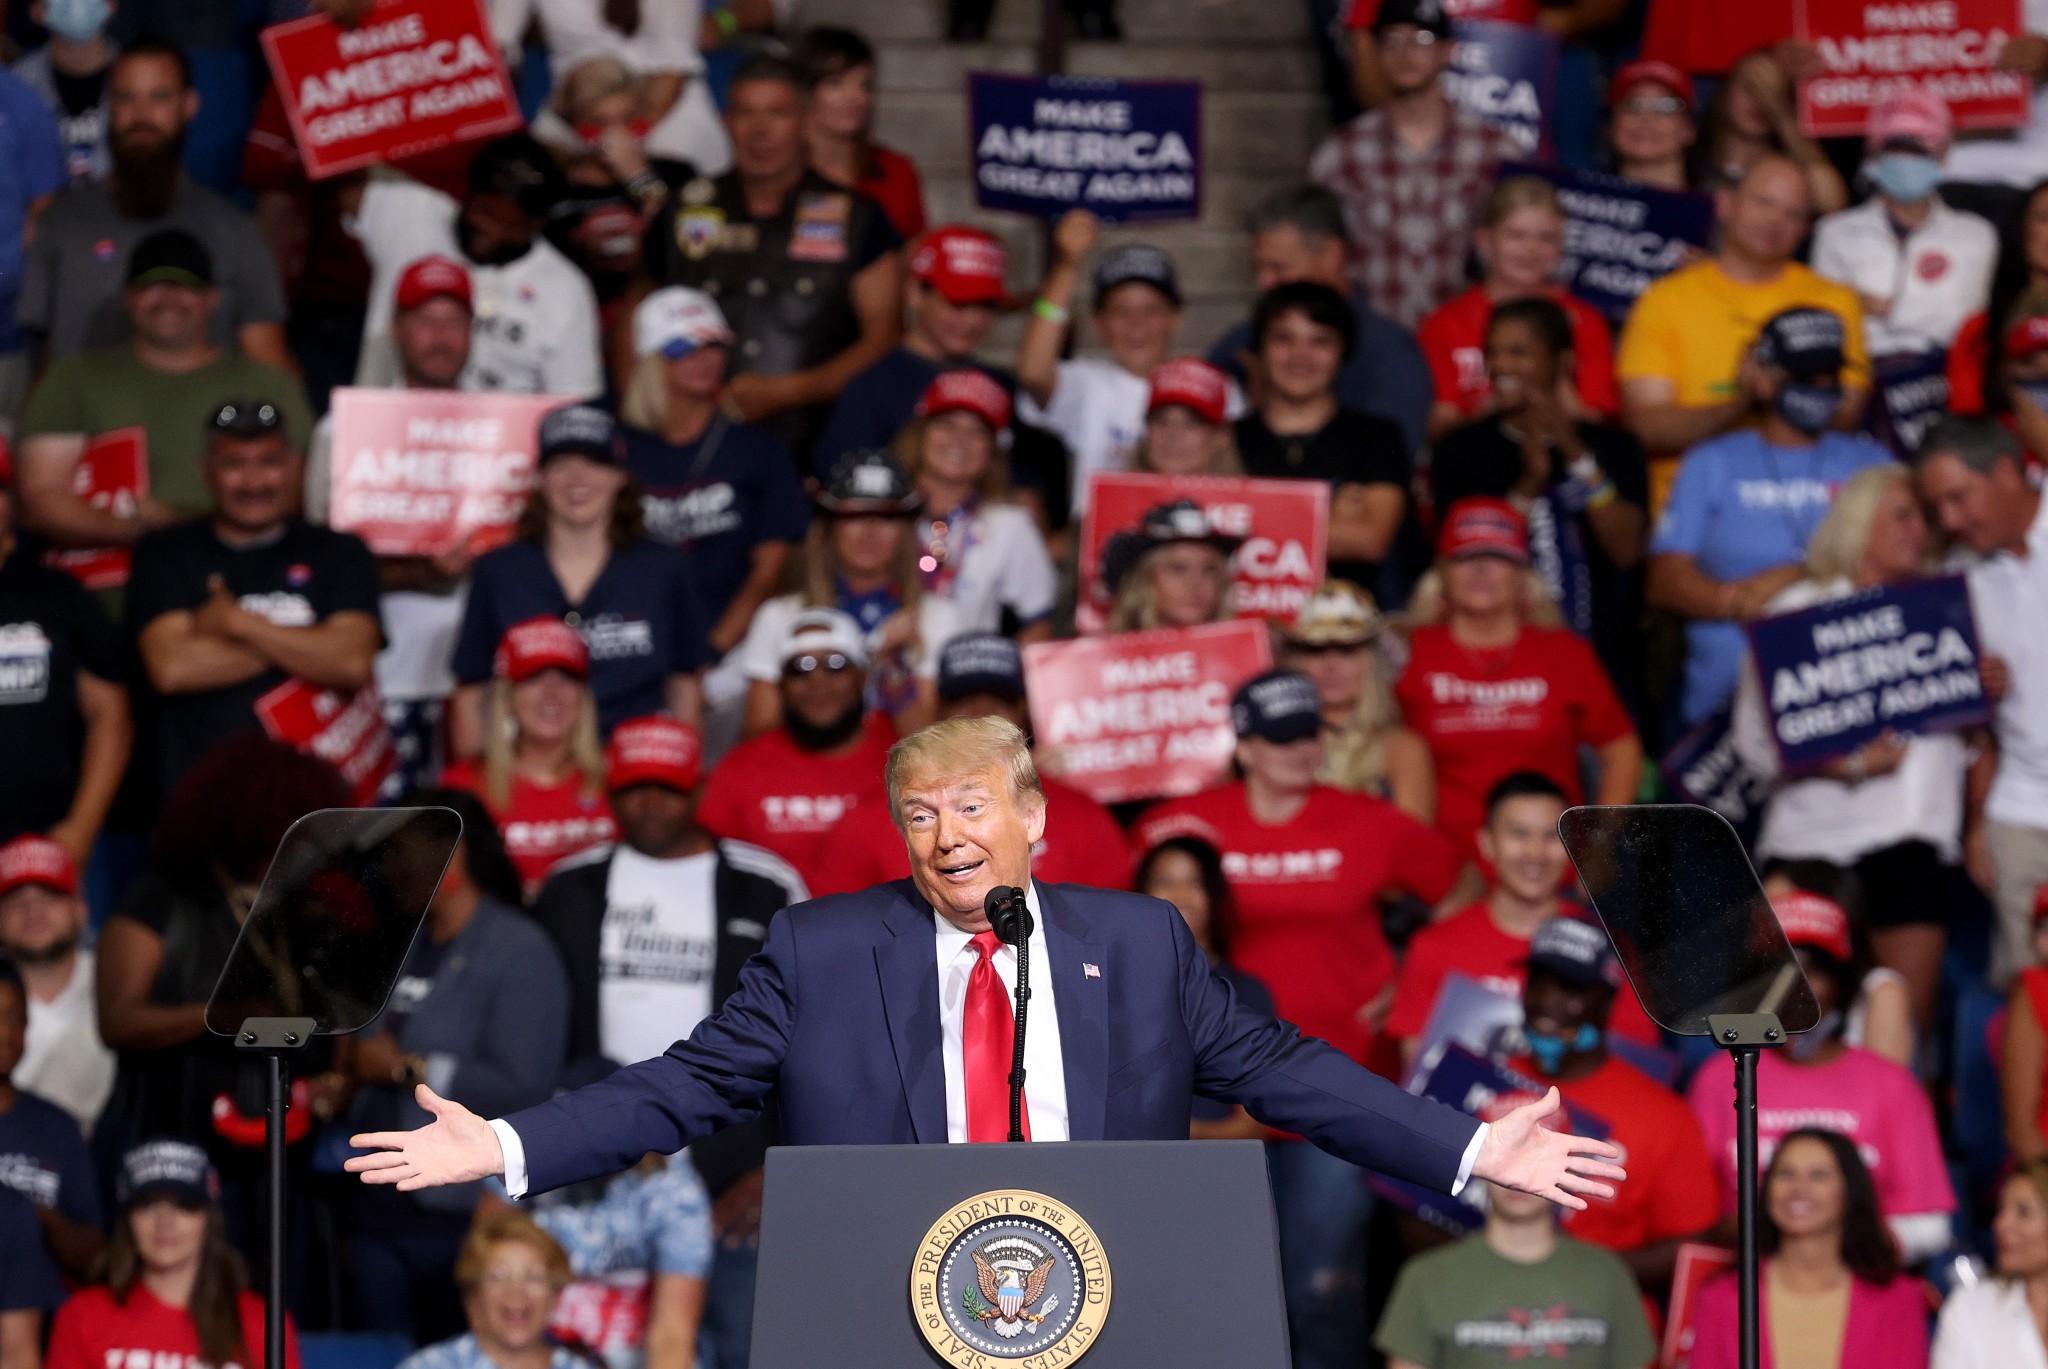 'Whiny b****': Anti-Trump Republican group mocks president over ramp walk